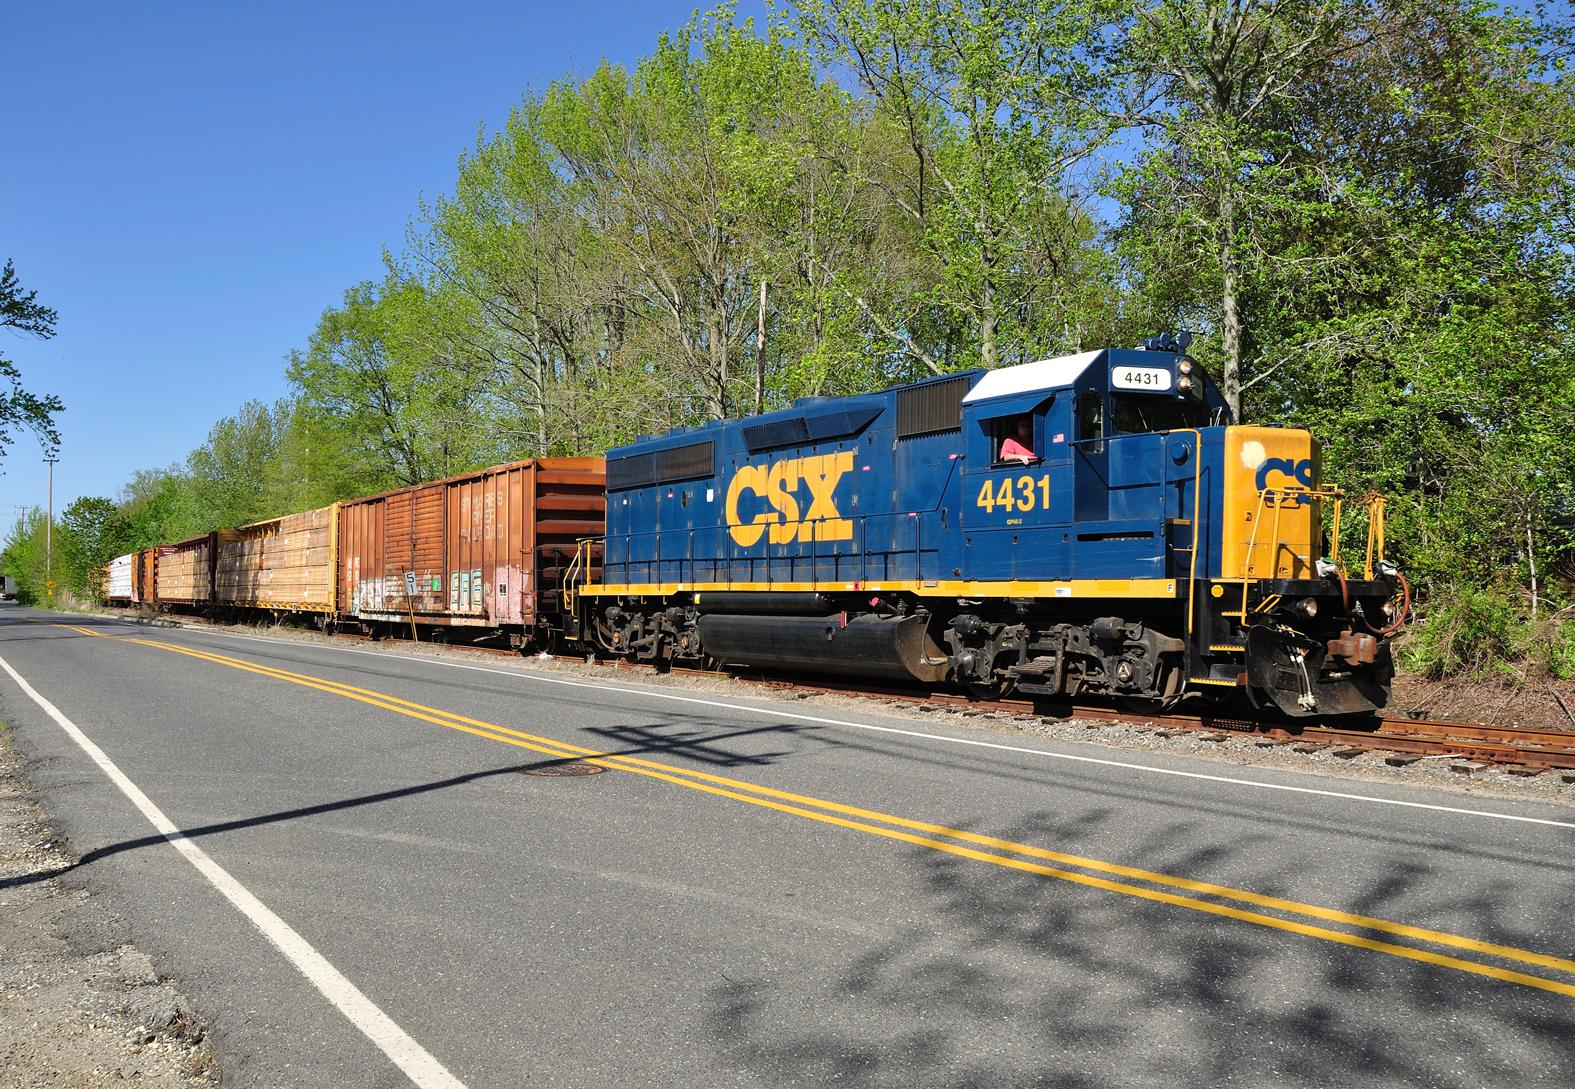 CSAO symbol SA31 bringing its small train through town on her way south to Lakewood, NJ.